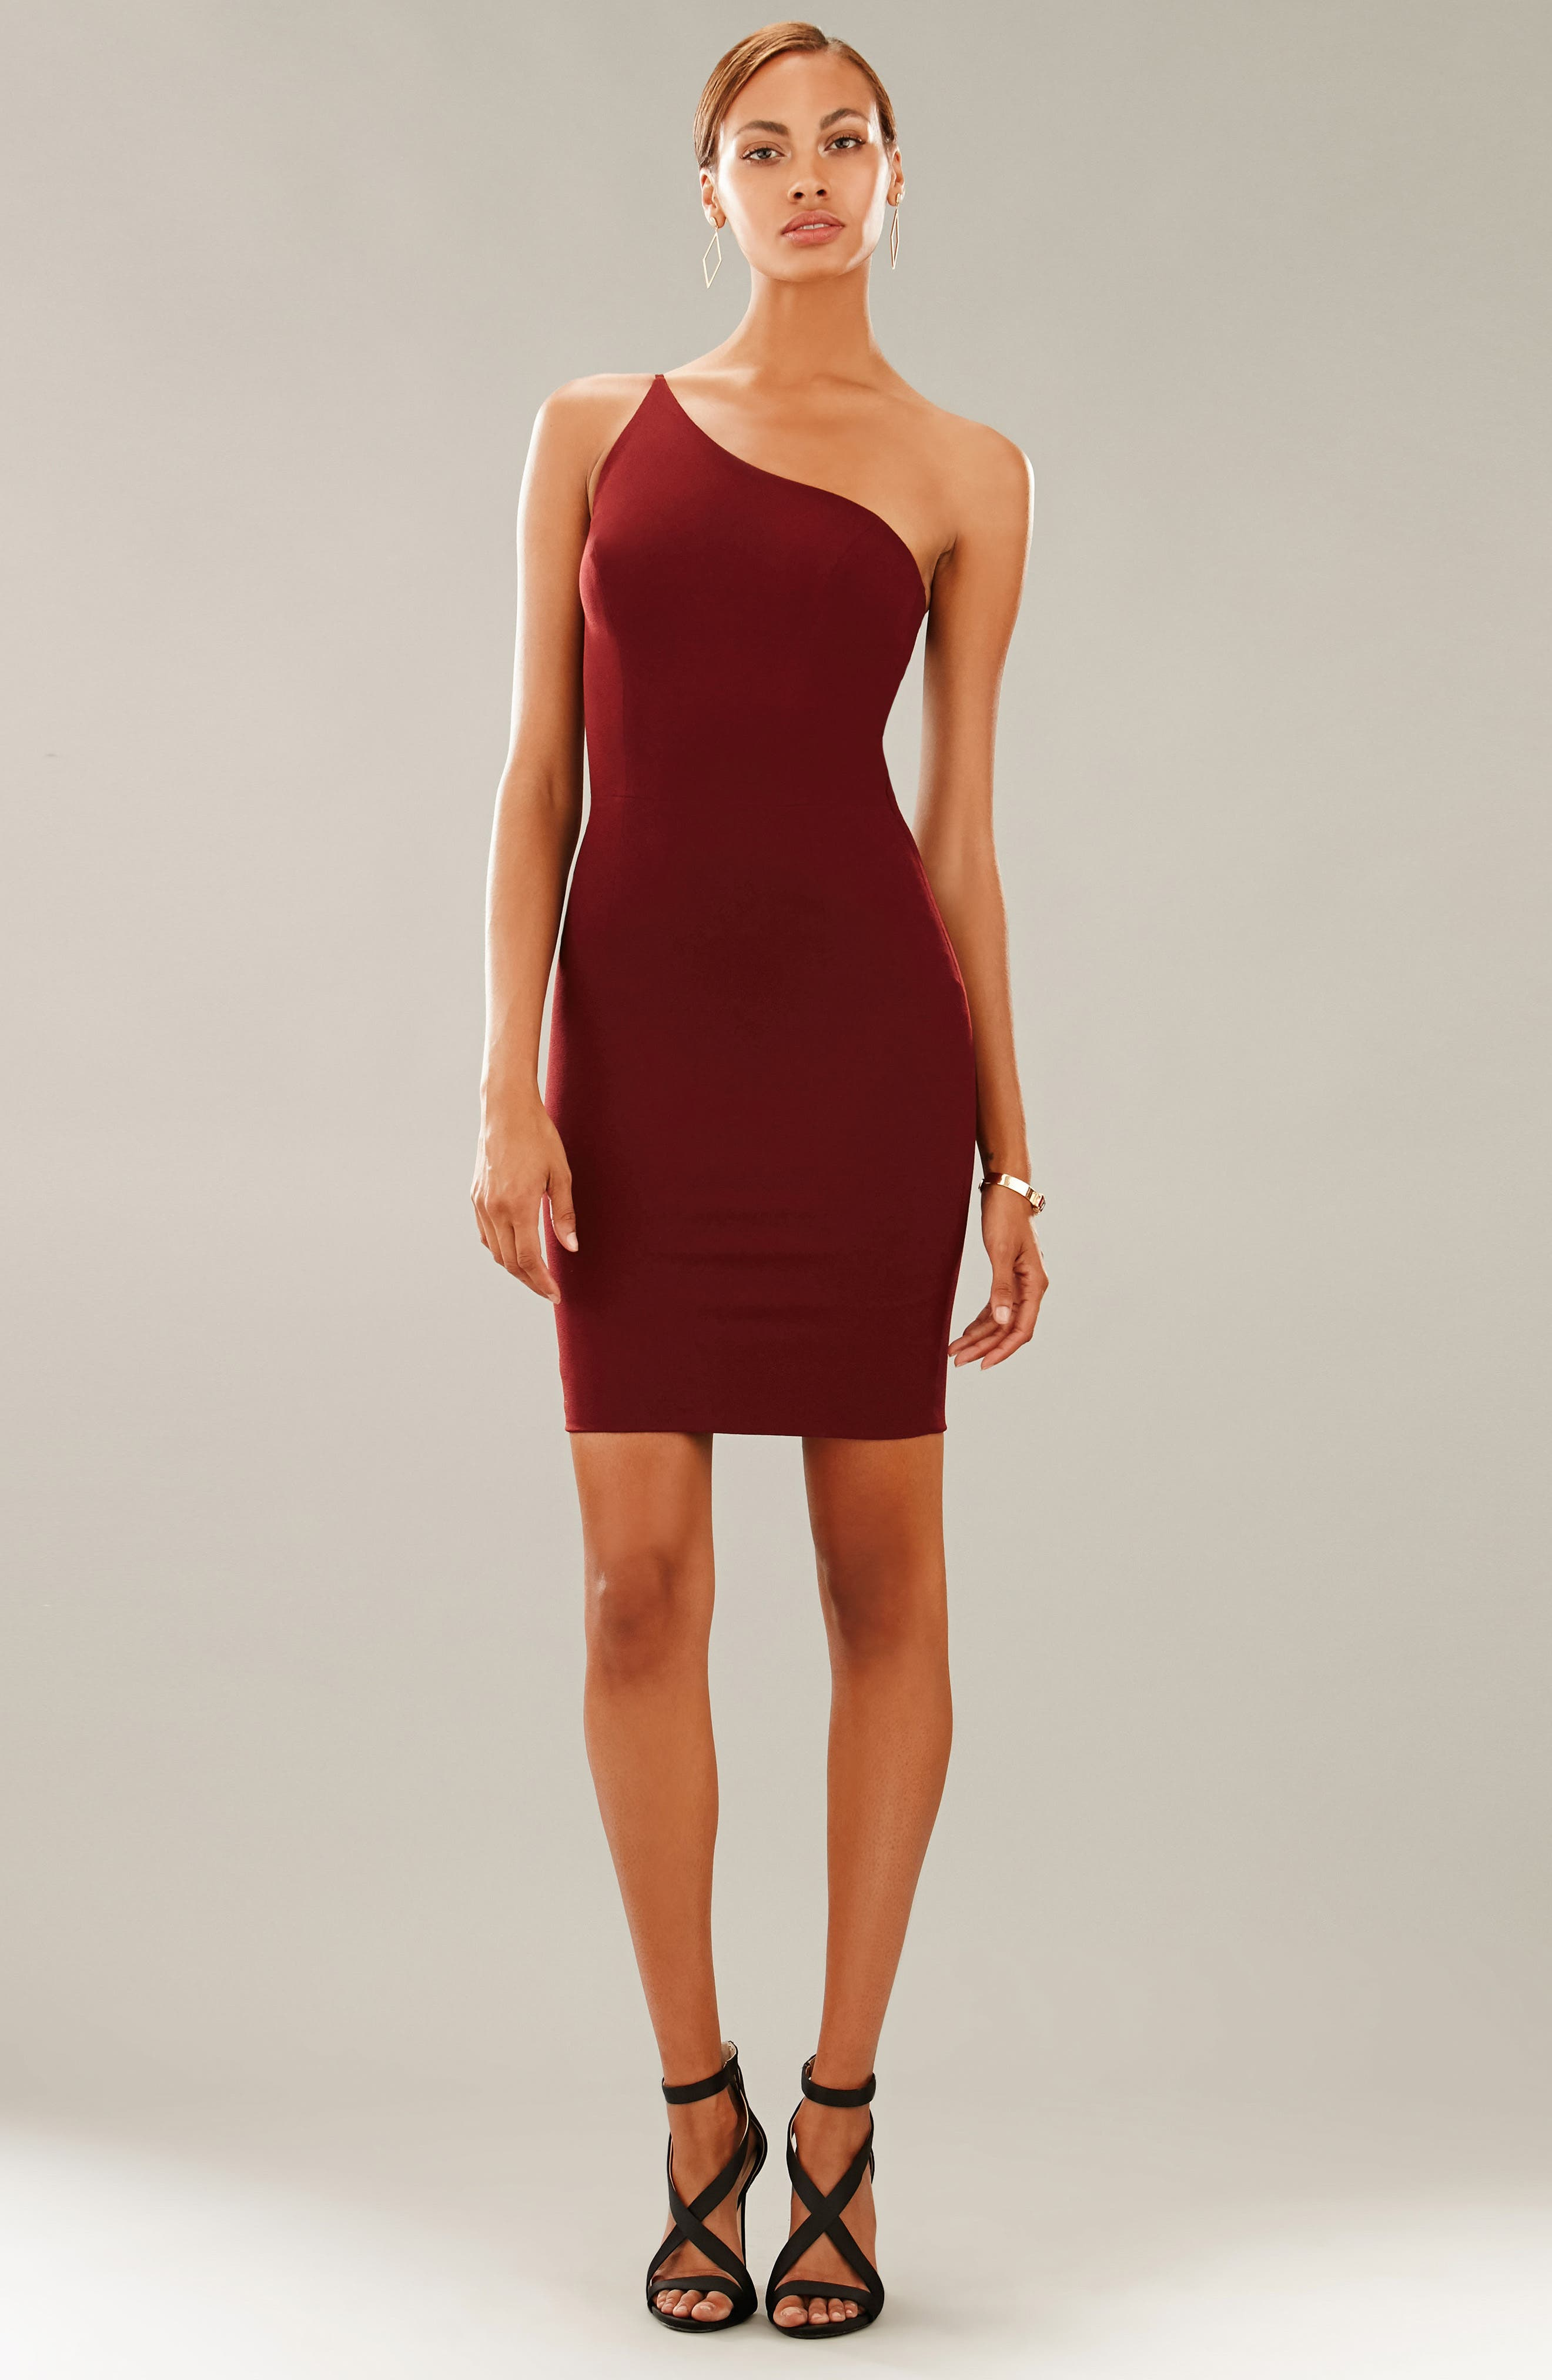 Jennifer One-Shoulder Body-Con Dress,                             Alternate thumbnail 2, color,                             Burgundy